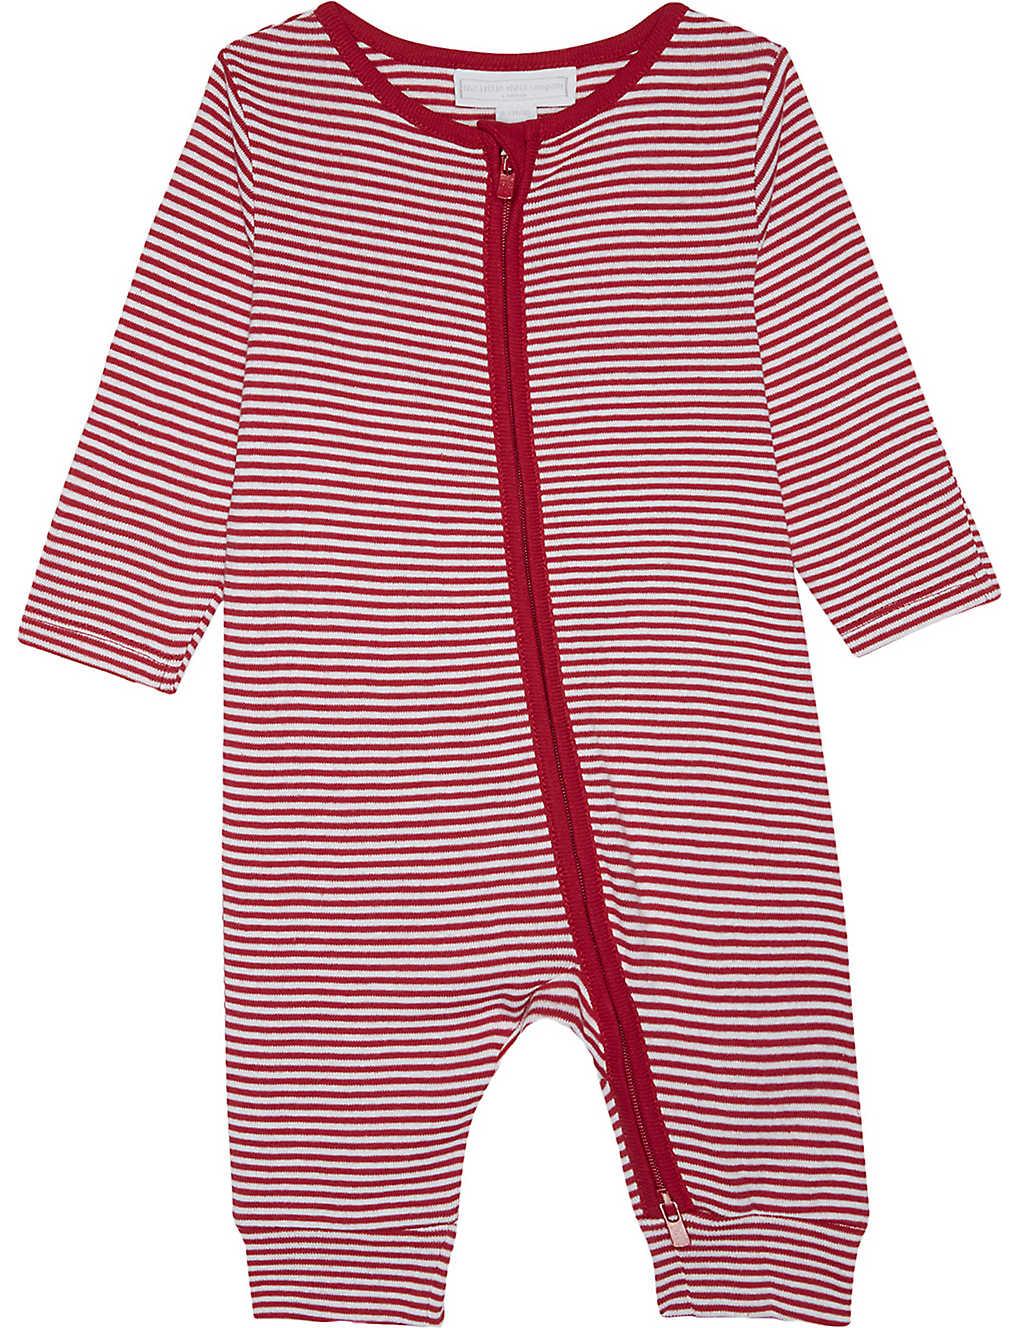 57733f1b83231 THE LITTLE WHITE COMPANY - Stripe zip-up sleepsuit